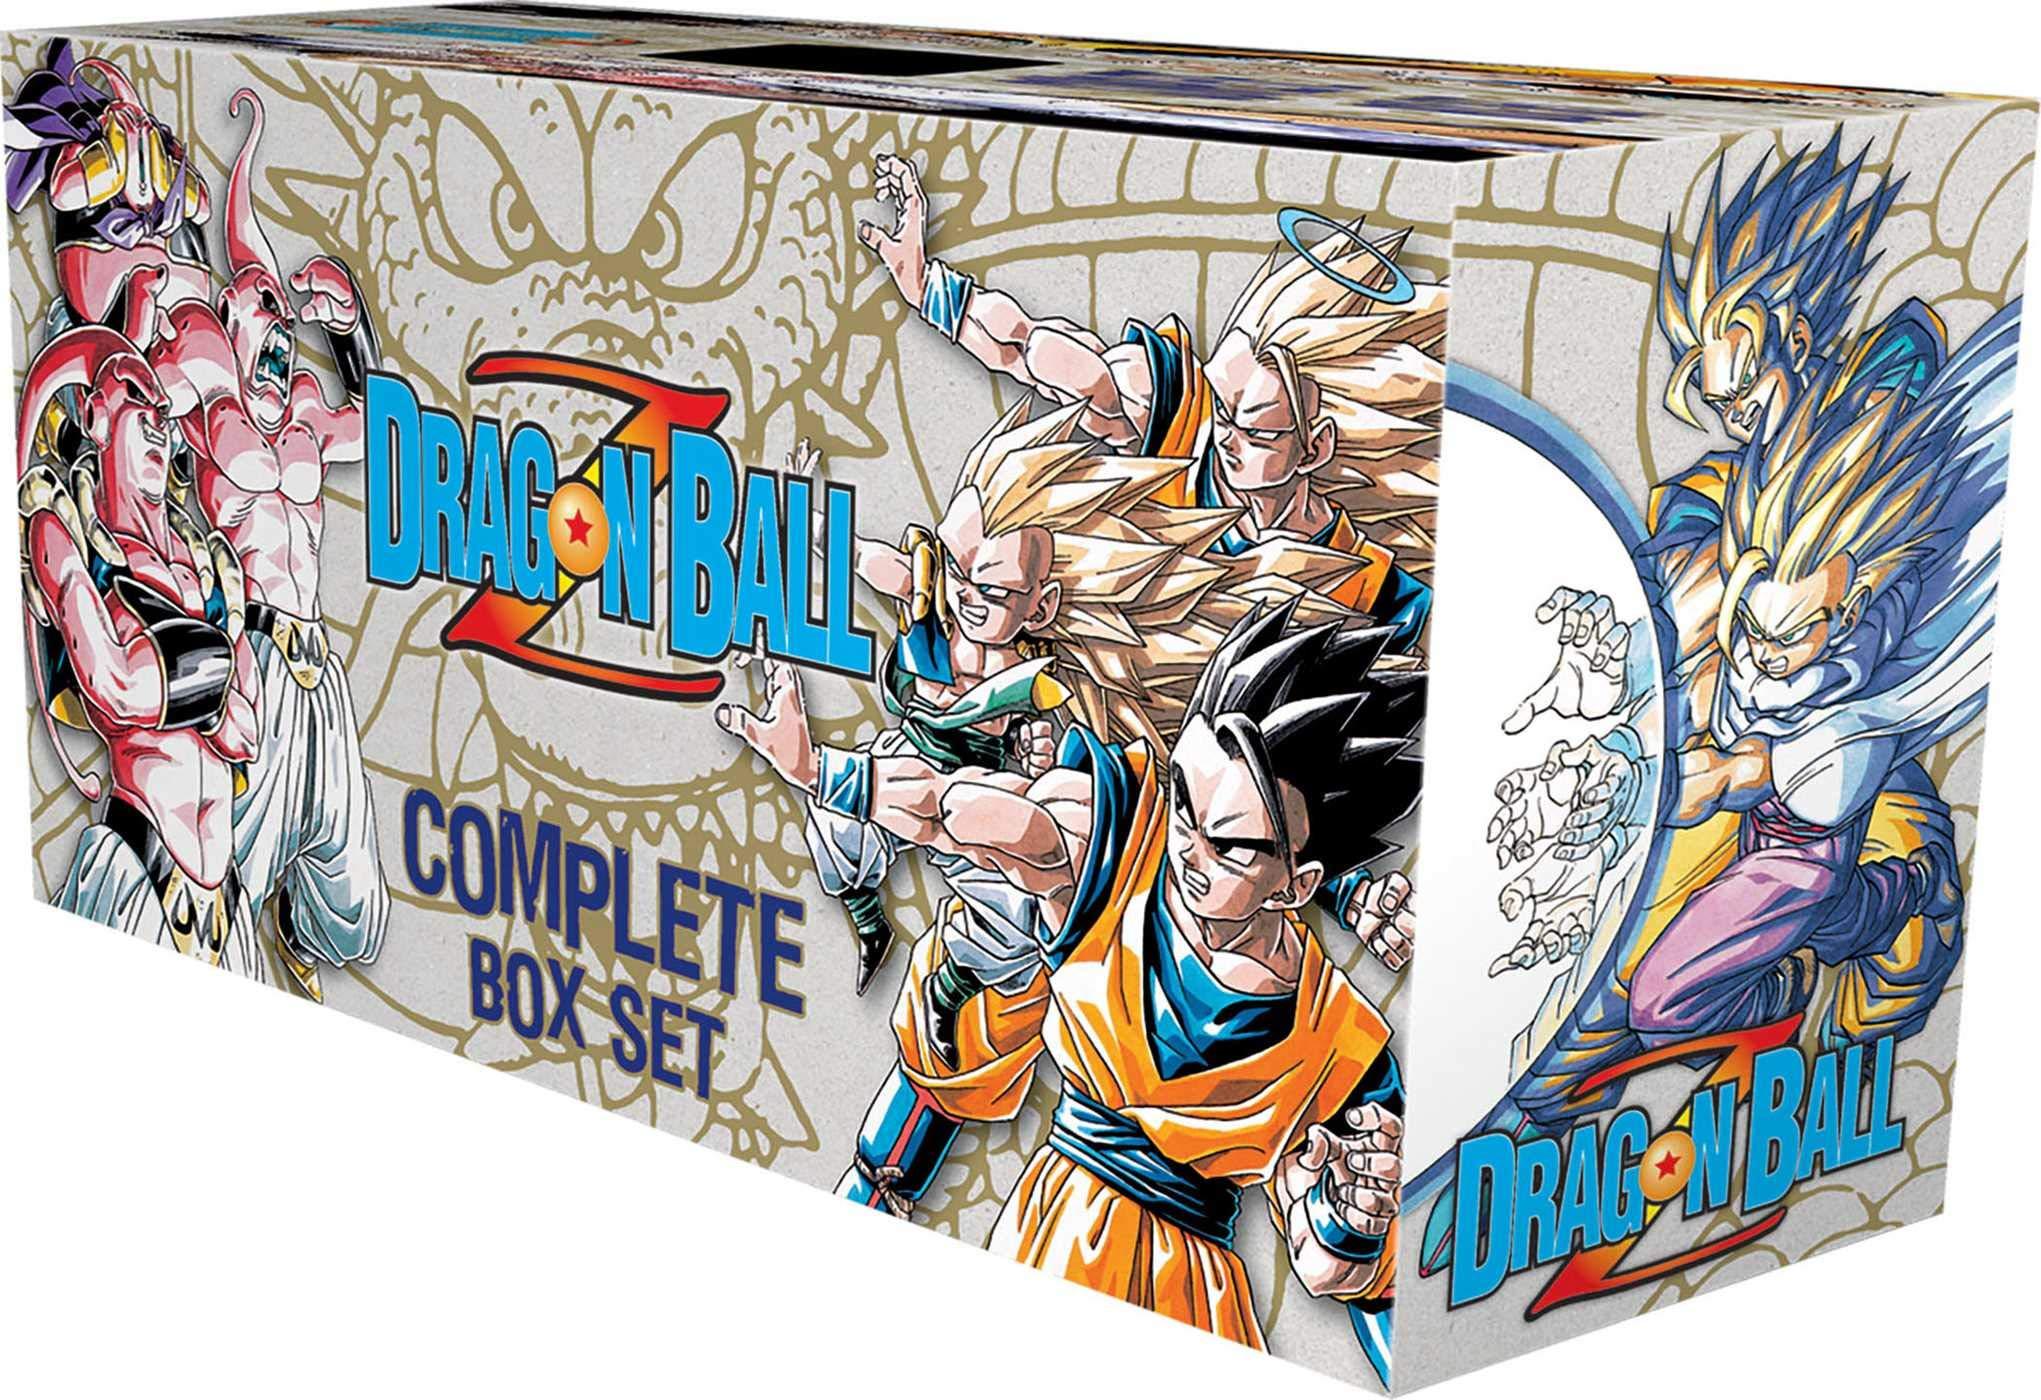 Dragon Ball Z Complete Box Set: Vols.